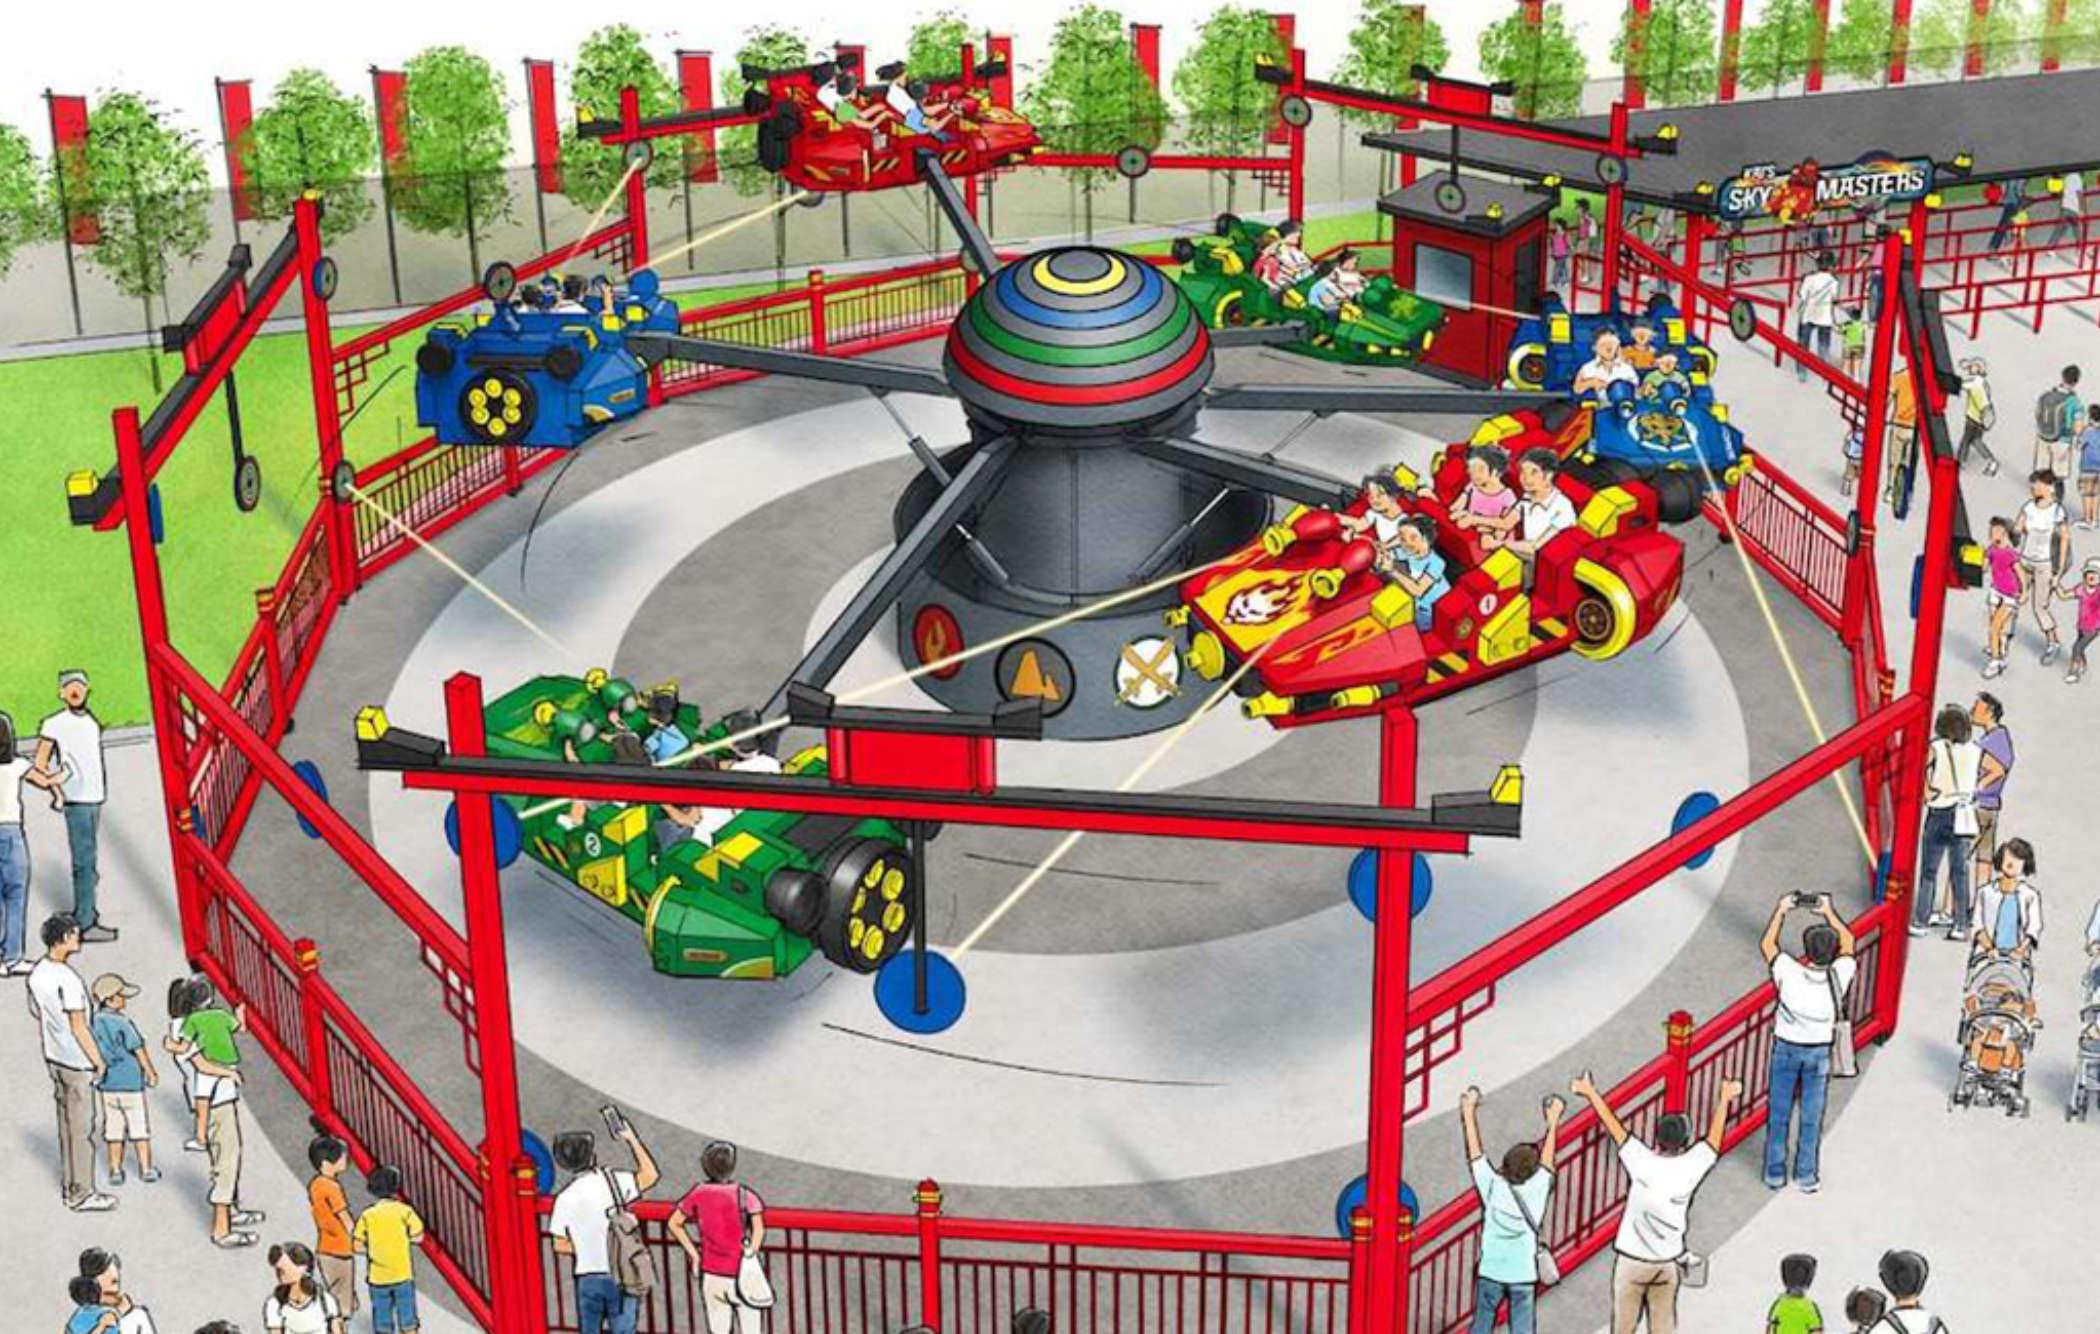 Kais Sky Masters Legoland Japan 6